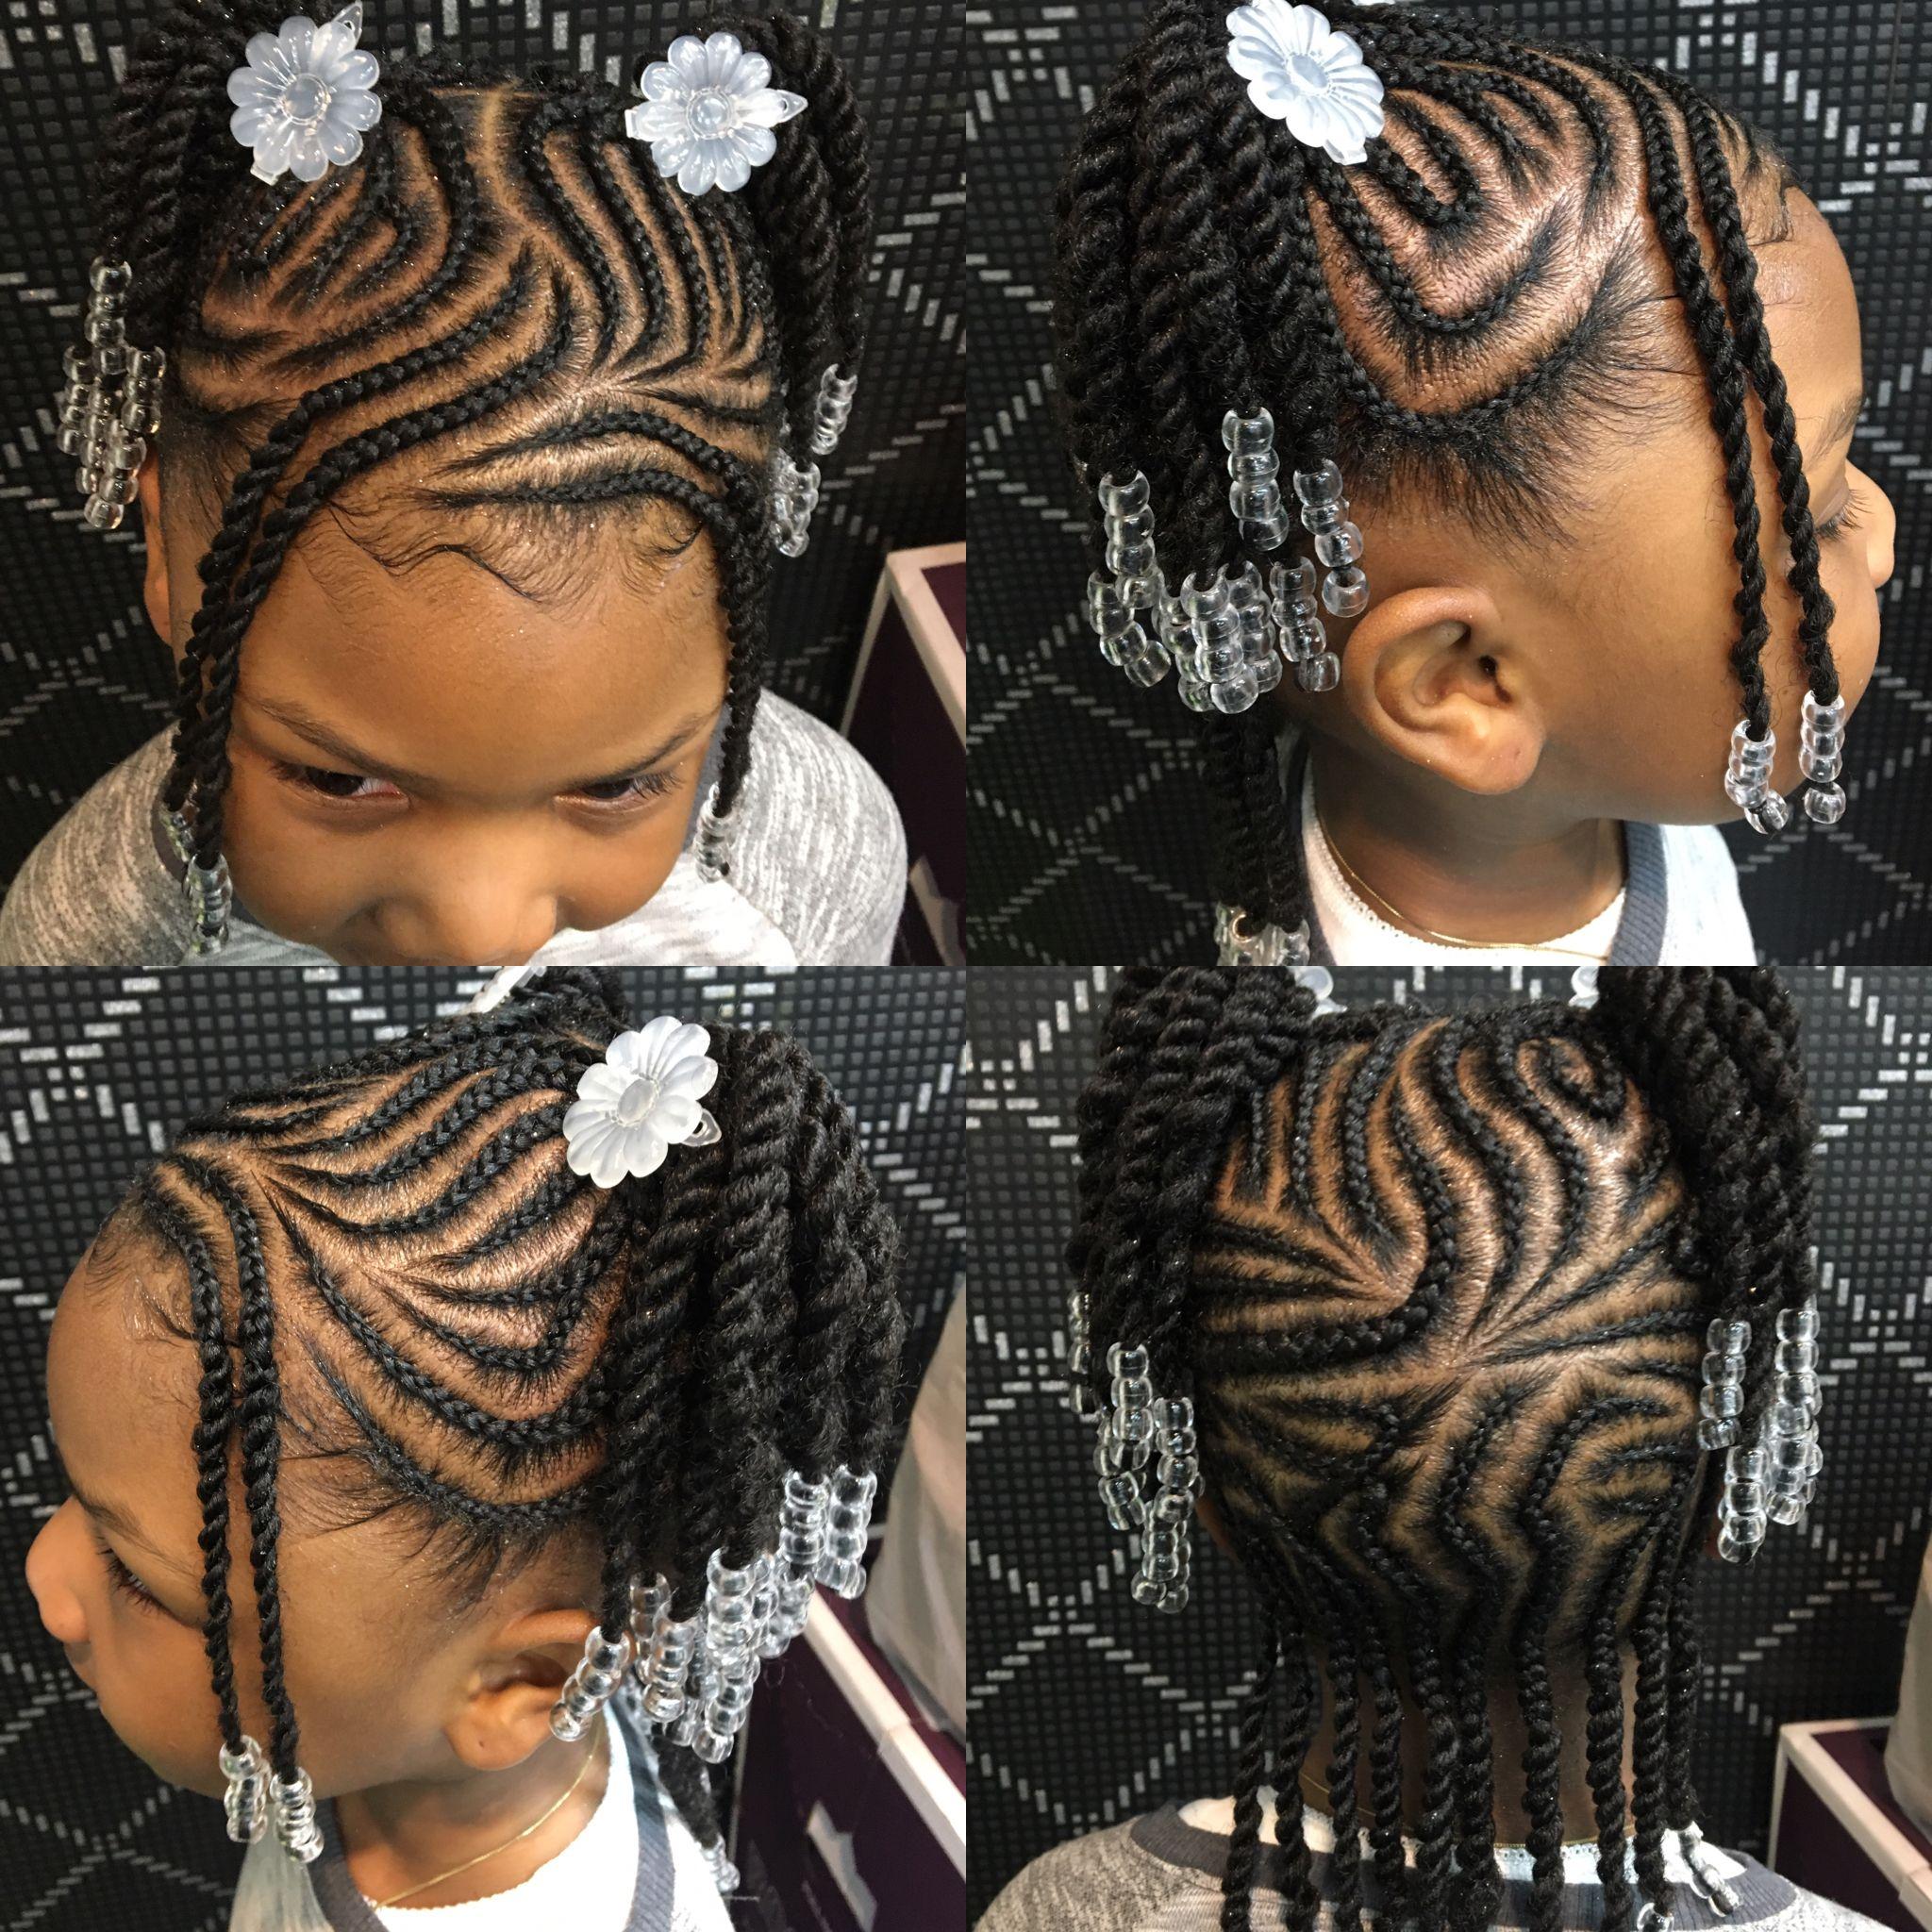 Braids With Design And Beads Kidshair Braidstyles Kids